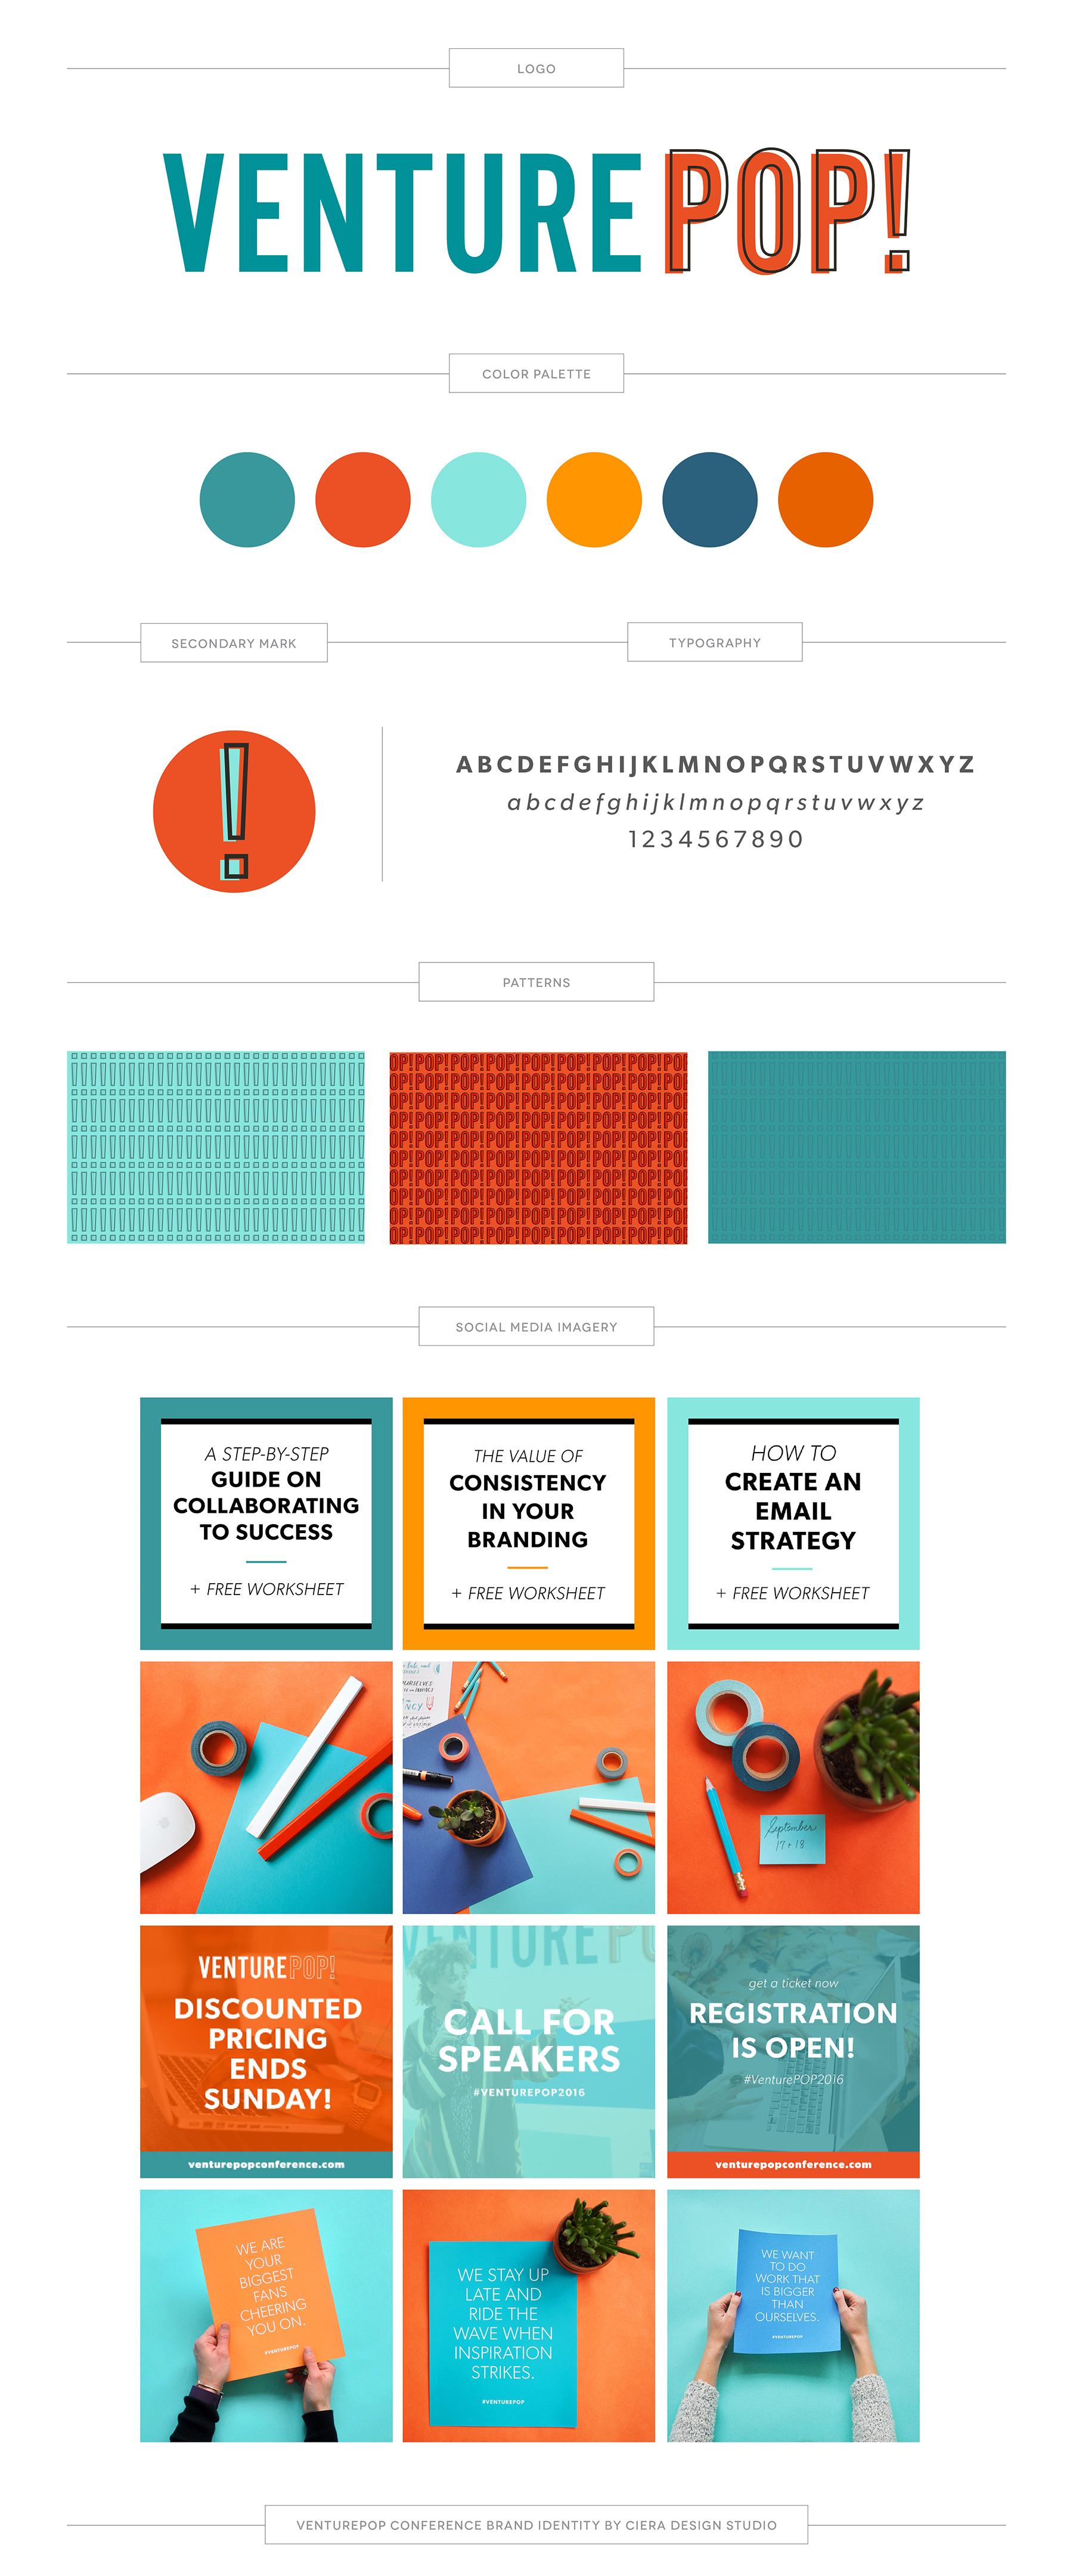 Brand Identity Design Creative Entrepreneur Conference